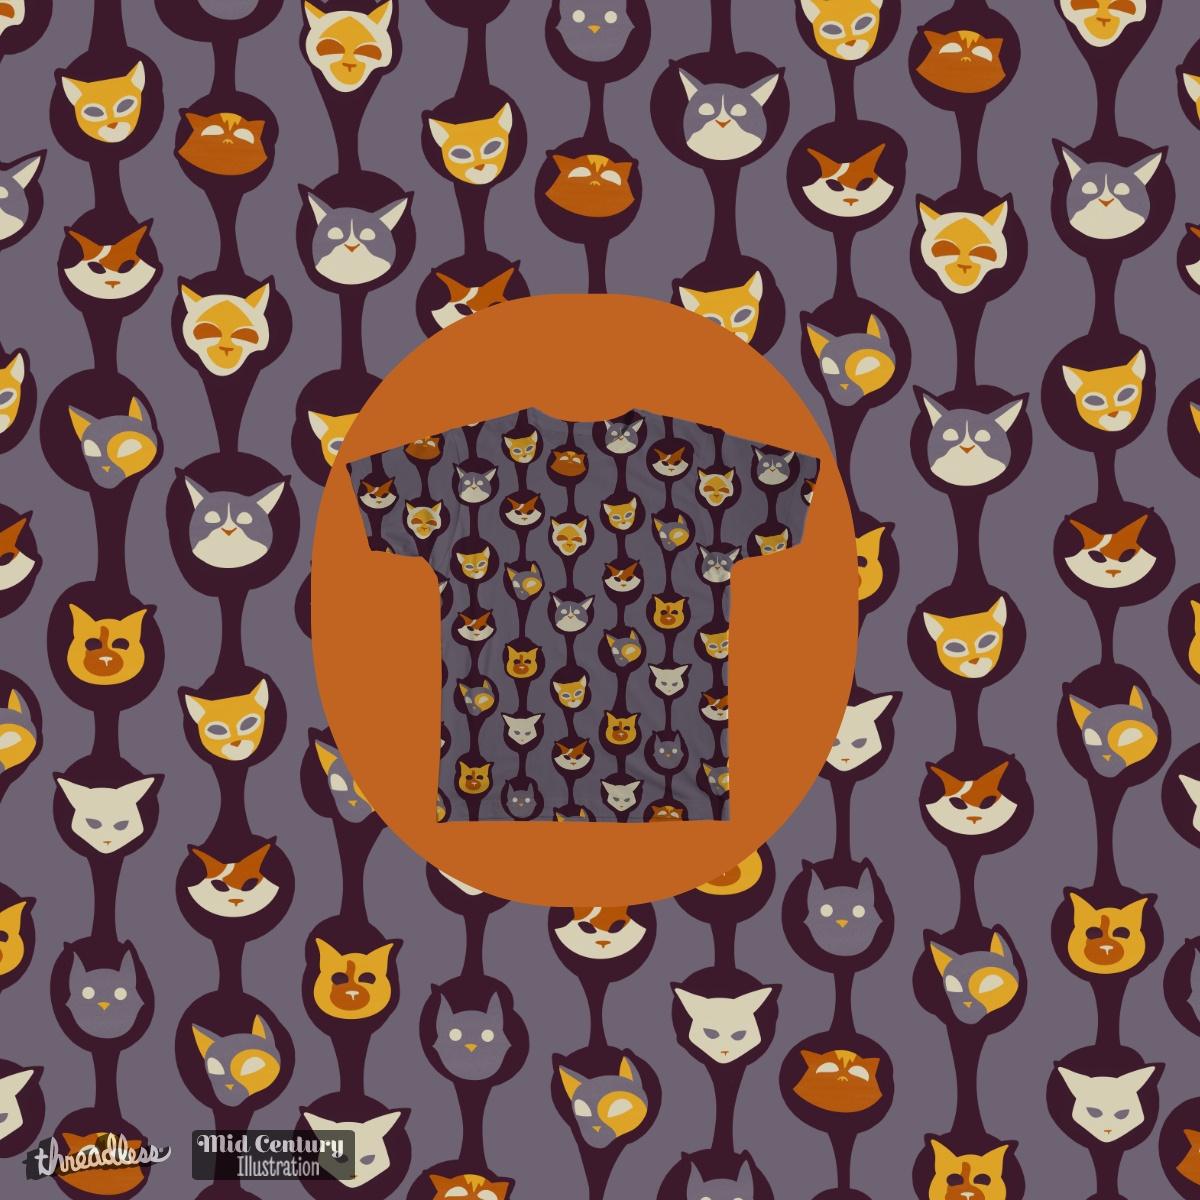 Cool Cats by WondrouStrange on Threadless